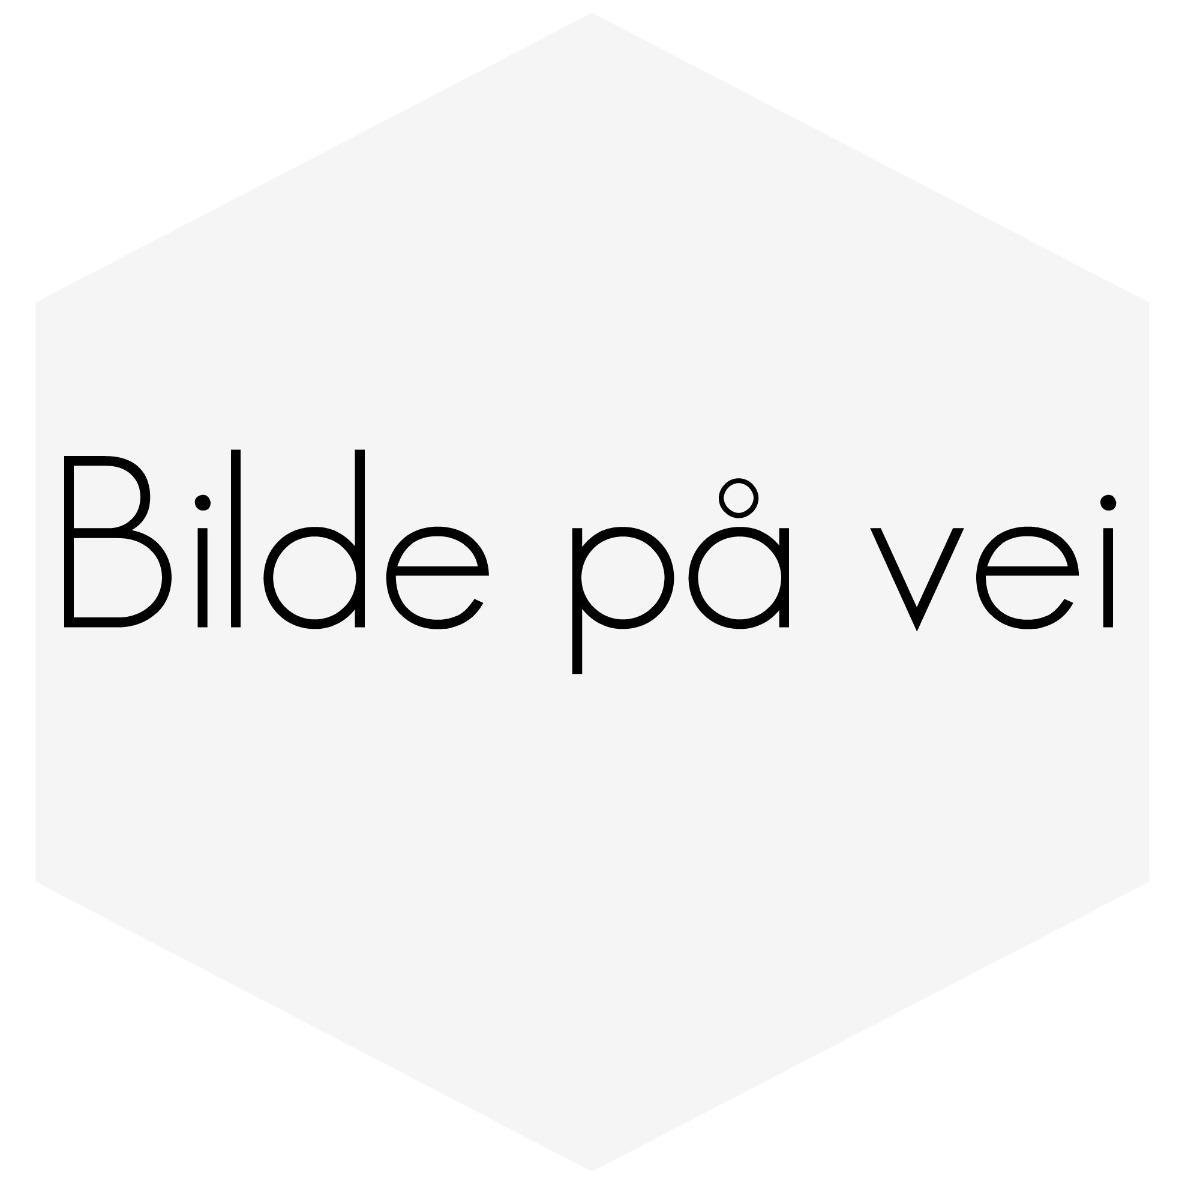 RADIATORSLANGE ØVRE 900 TURBO/AC 1378106, 3547147, 6842129